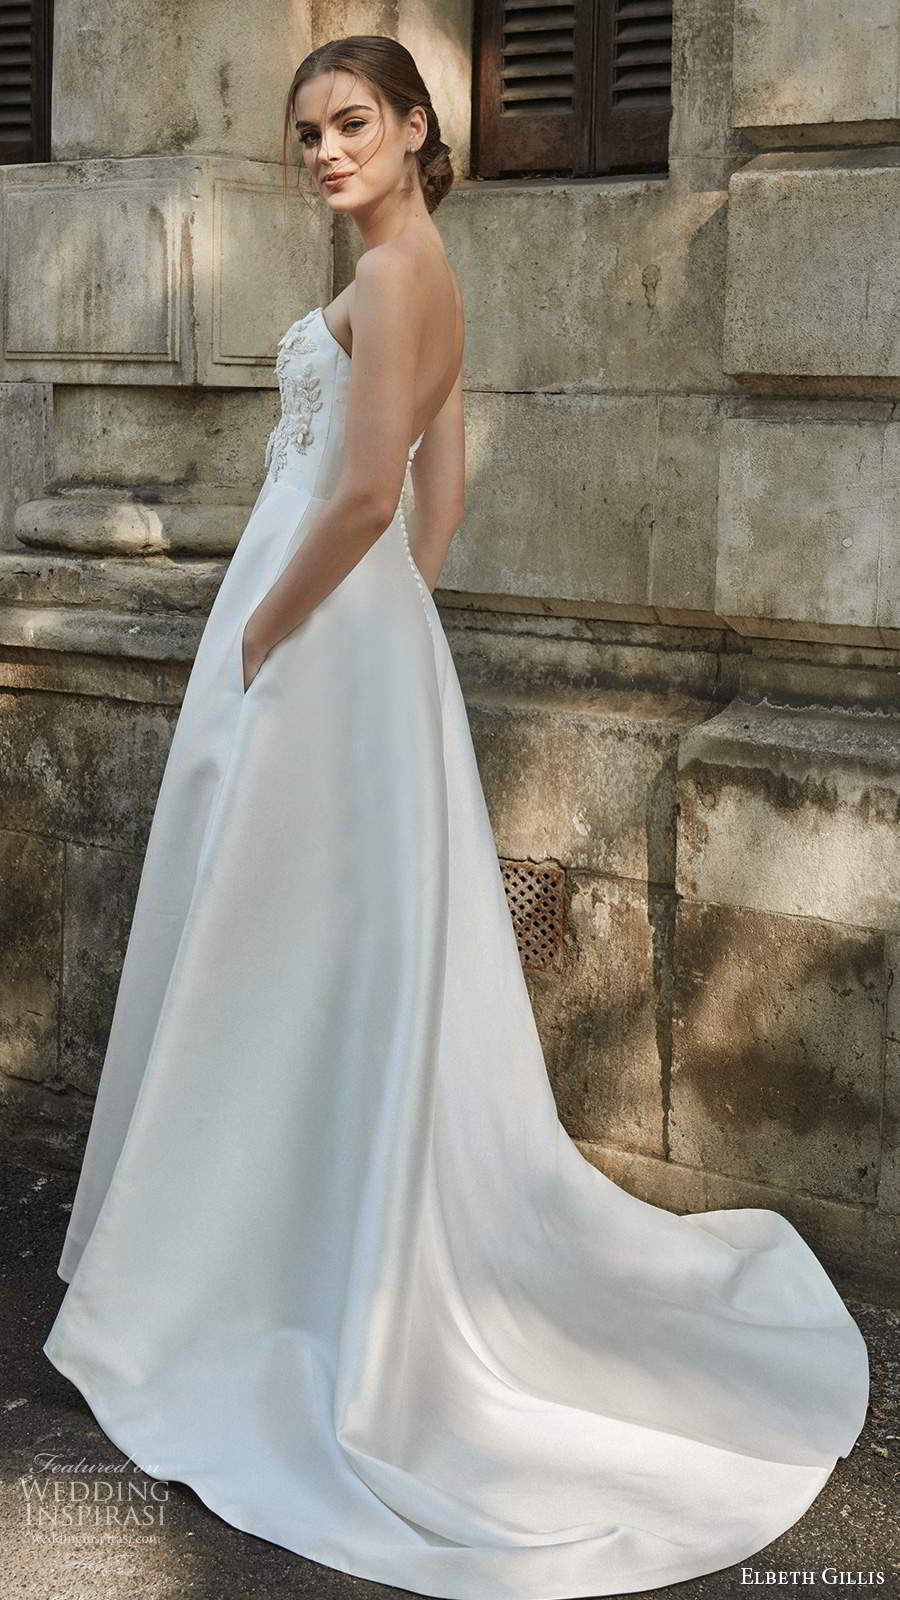 elbeth gillis 2021 bridal strapless plunging sweetheart neckline embellished bodice a line ball gown wedding dress chapel train (13) bv